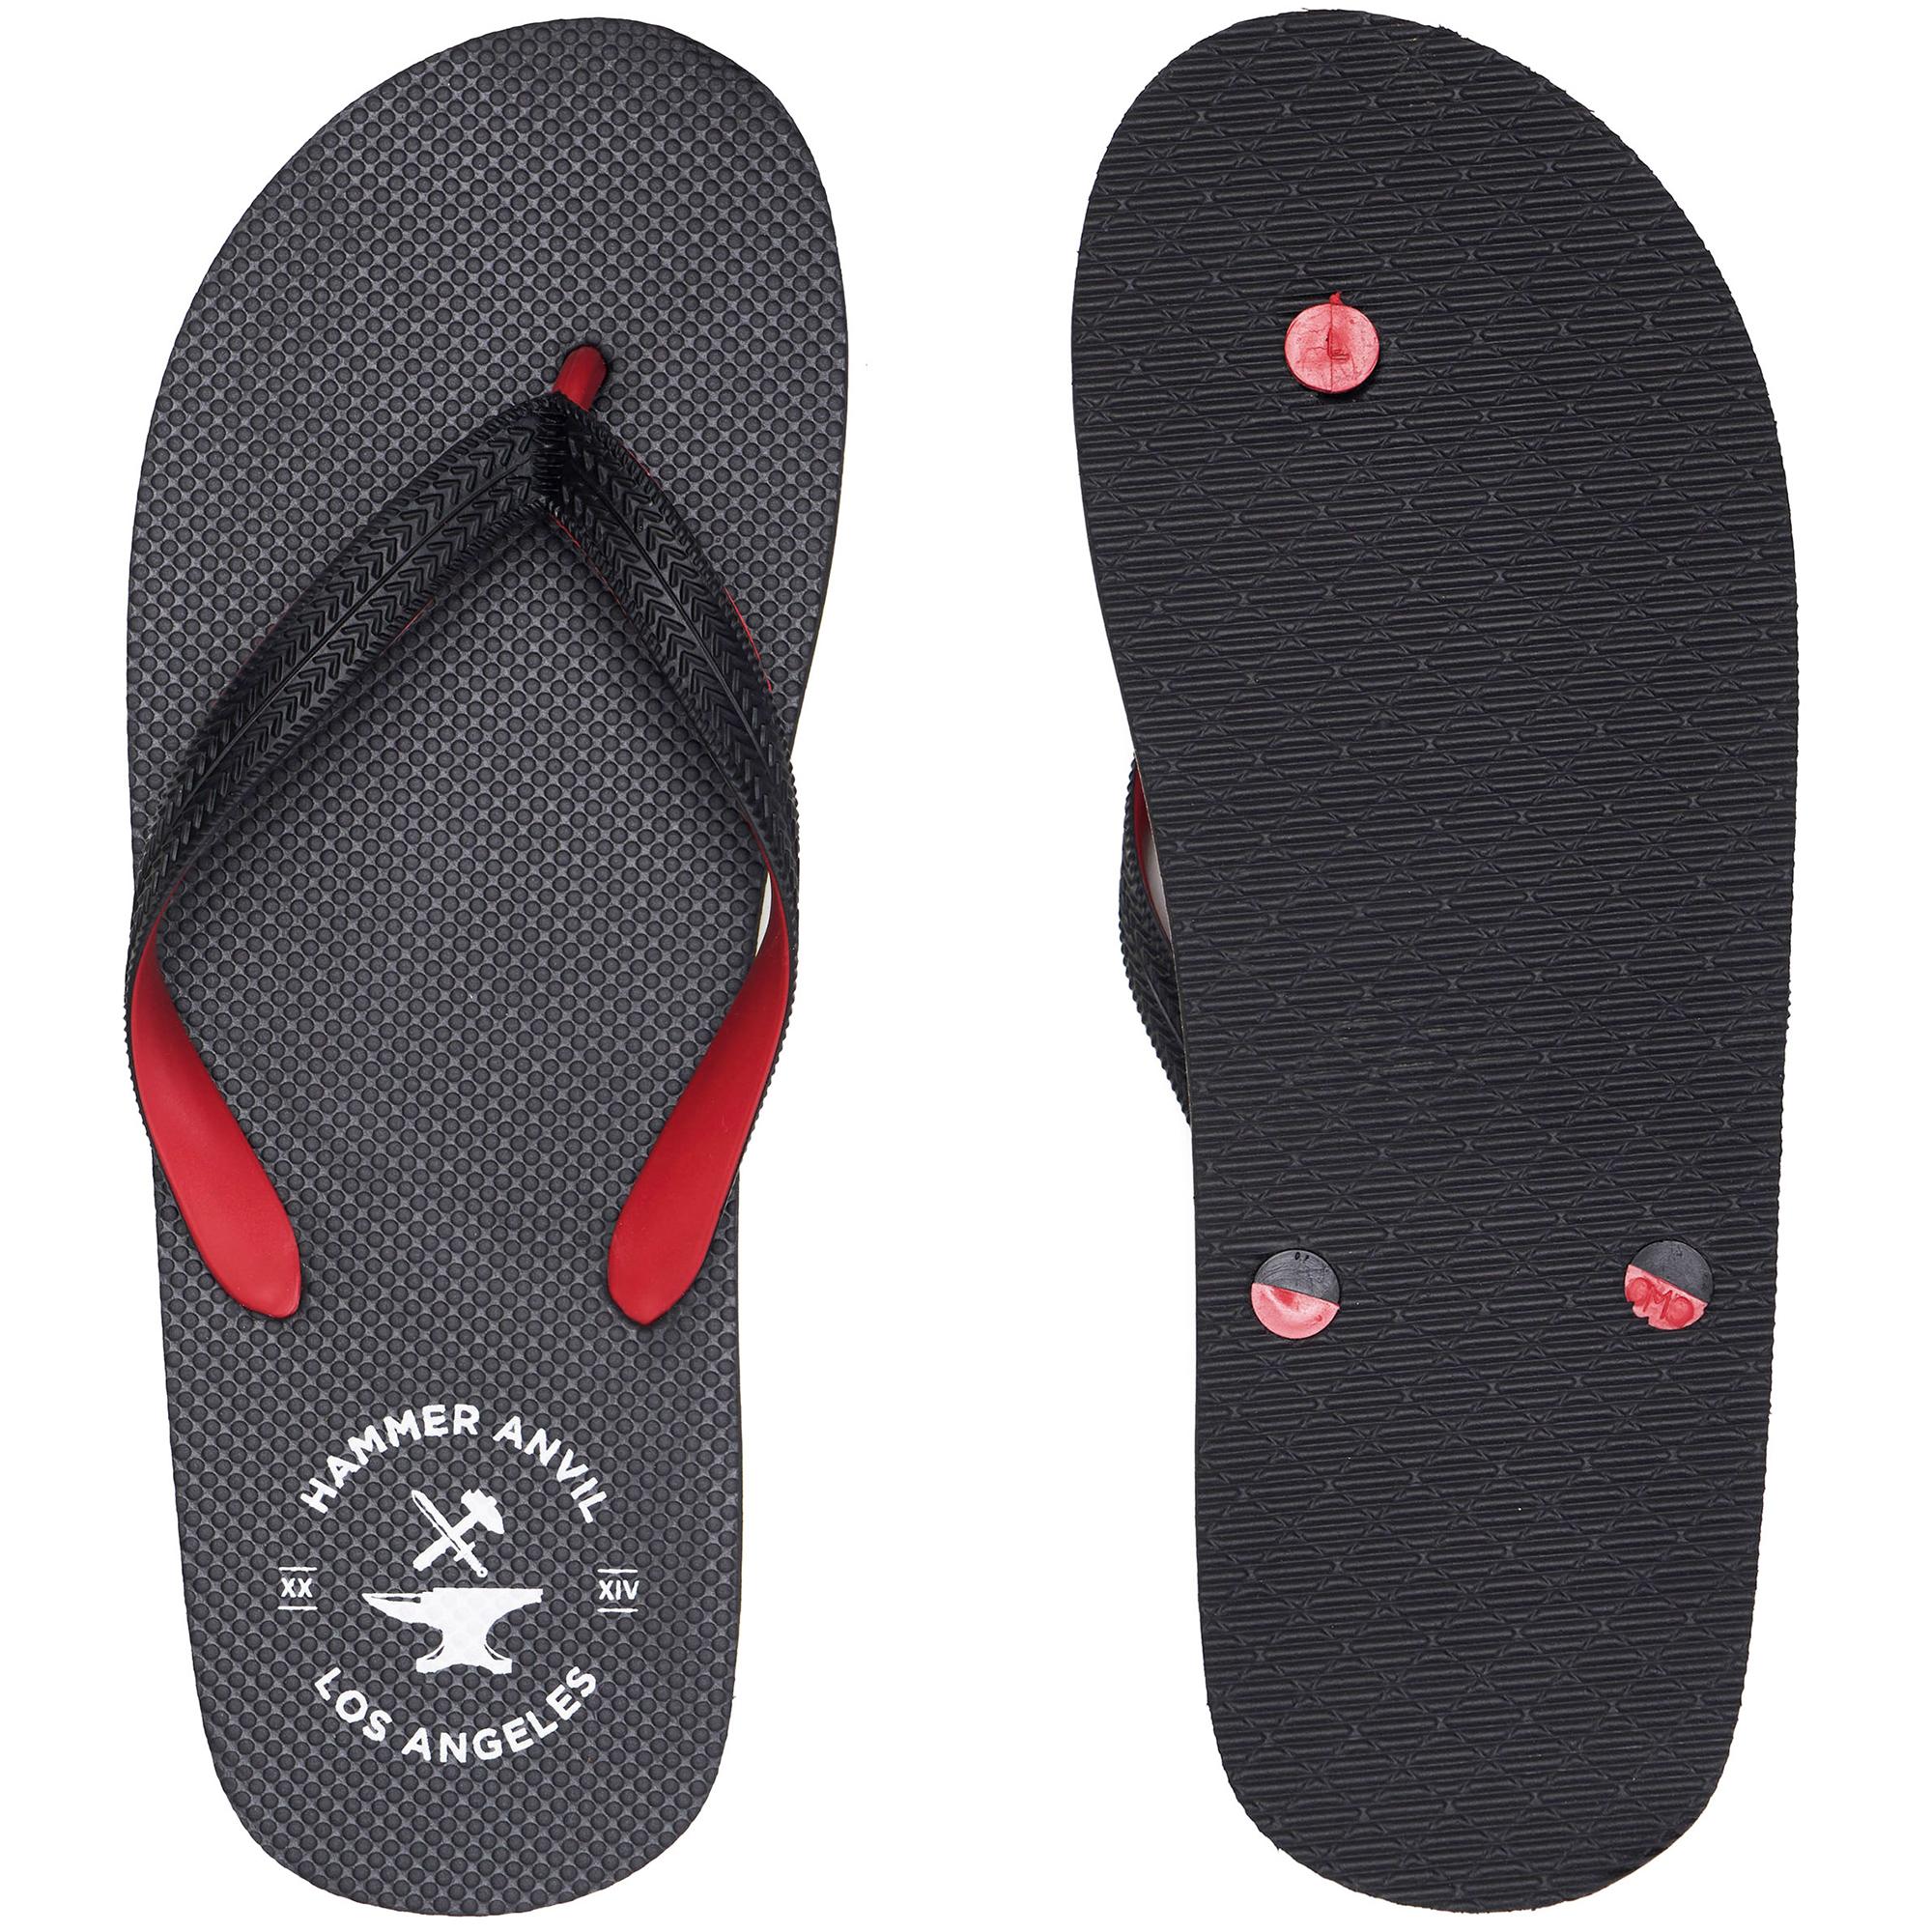 Hammer-Anvil-Mens-Flip-Flops-Casual-Thong-Summer-Sandals-Comfortable-Beach-Shoes thumbnail 33